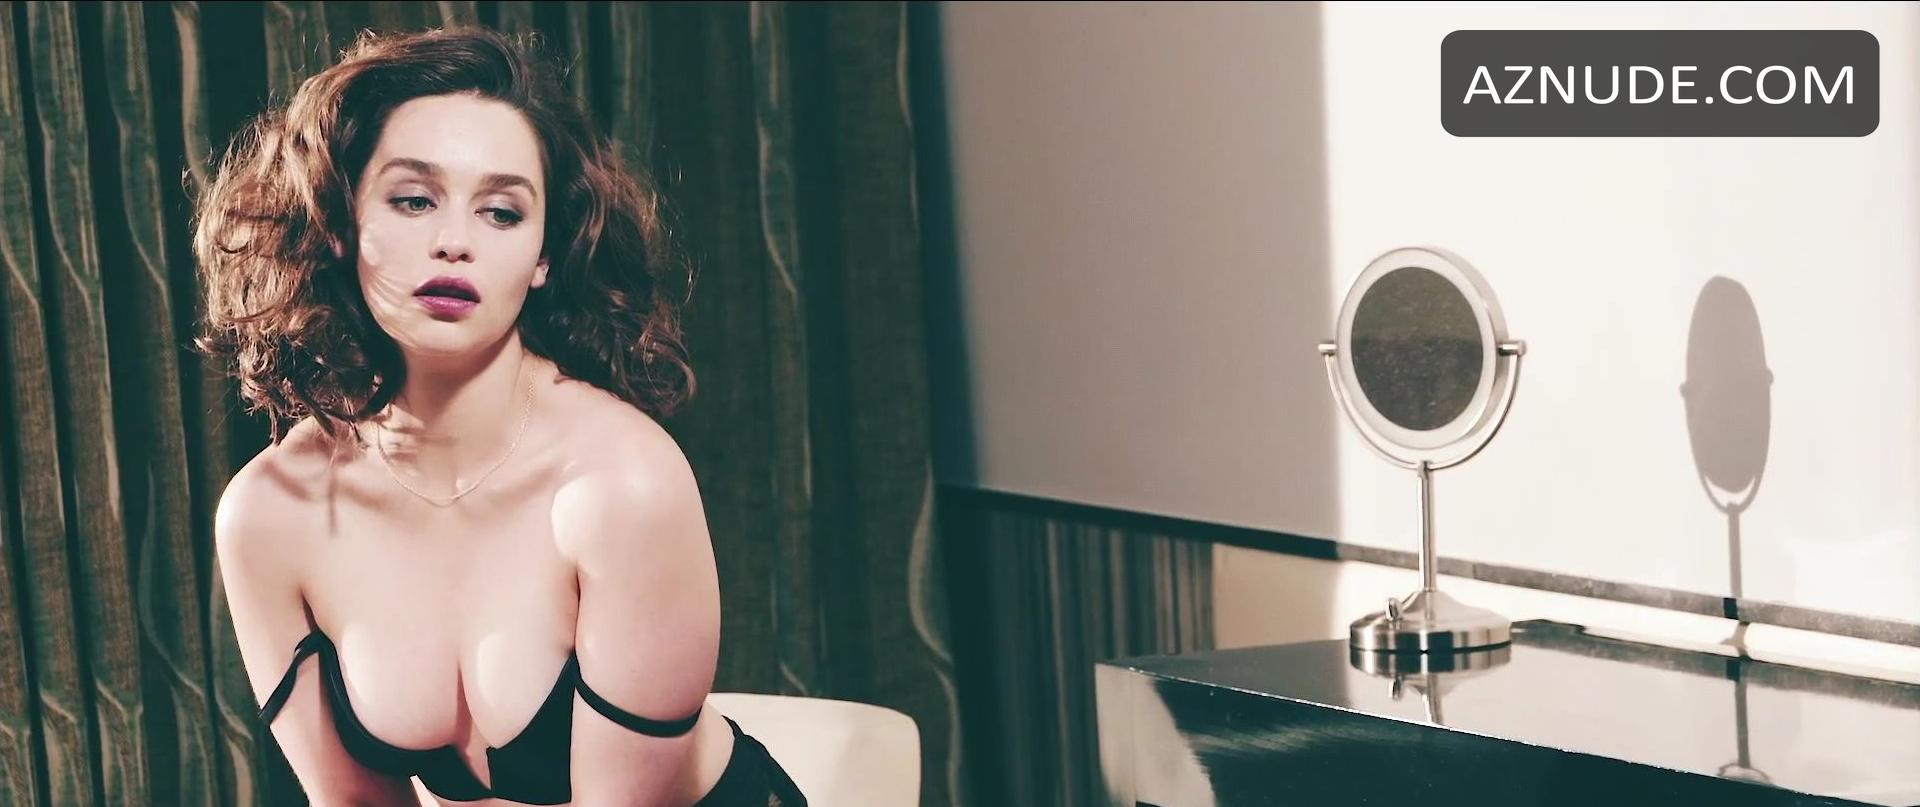 Emilia Clarke Esquire Photo Shoot Nude Scenes - Aznude-3873